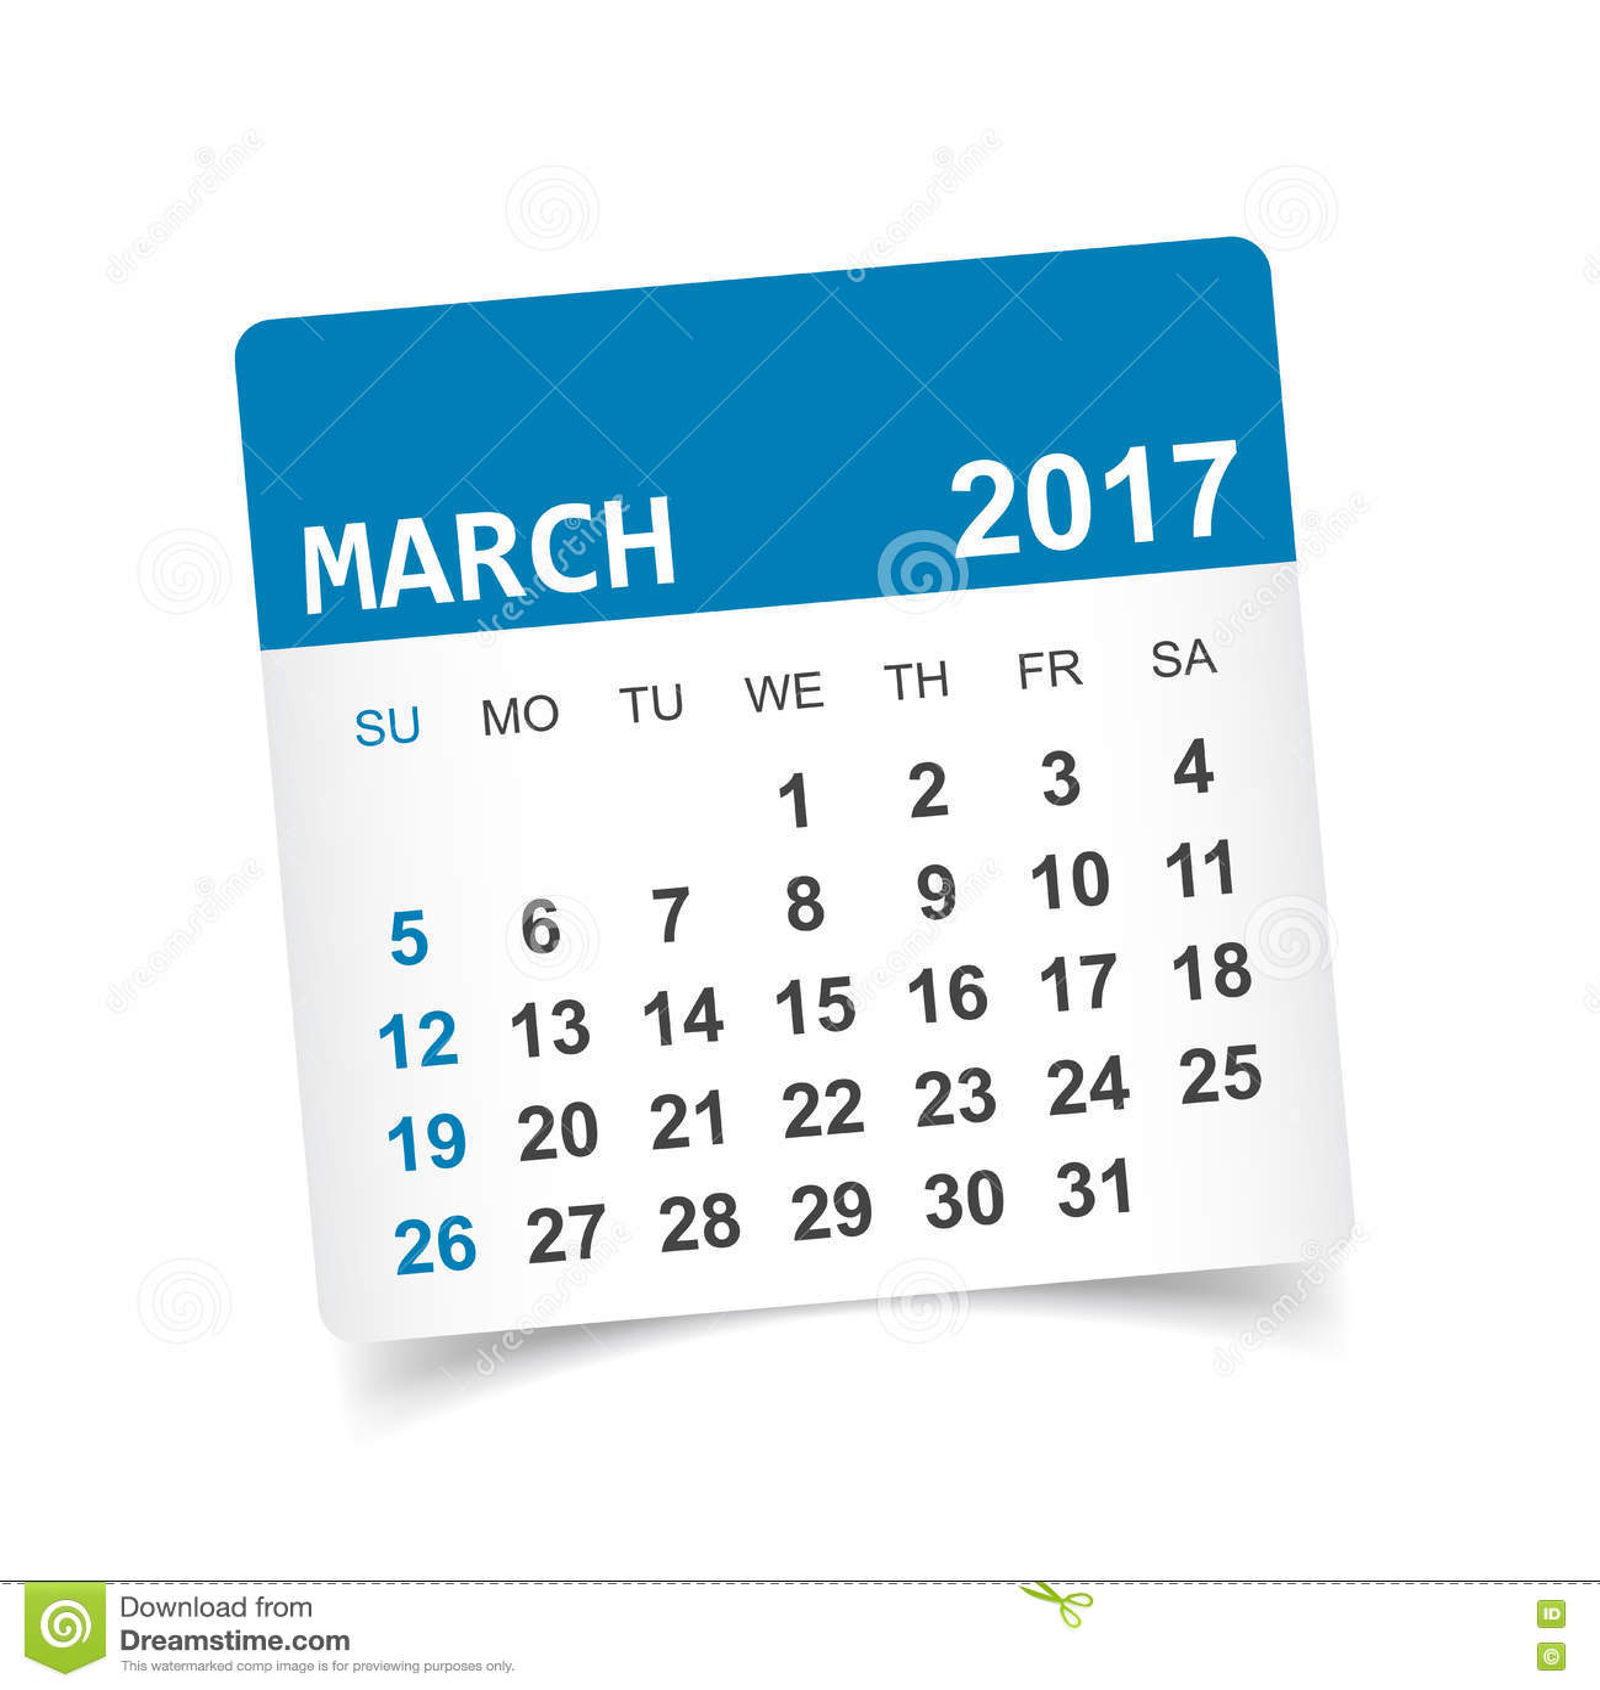 mars 2017 | amandawigholm